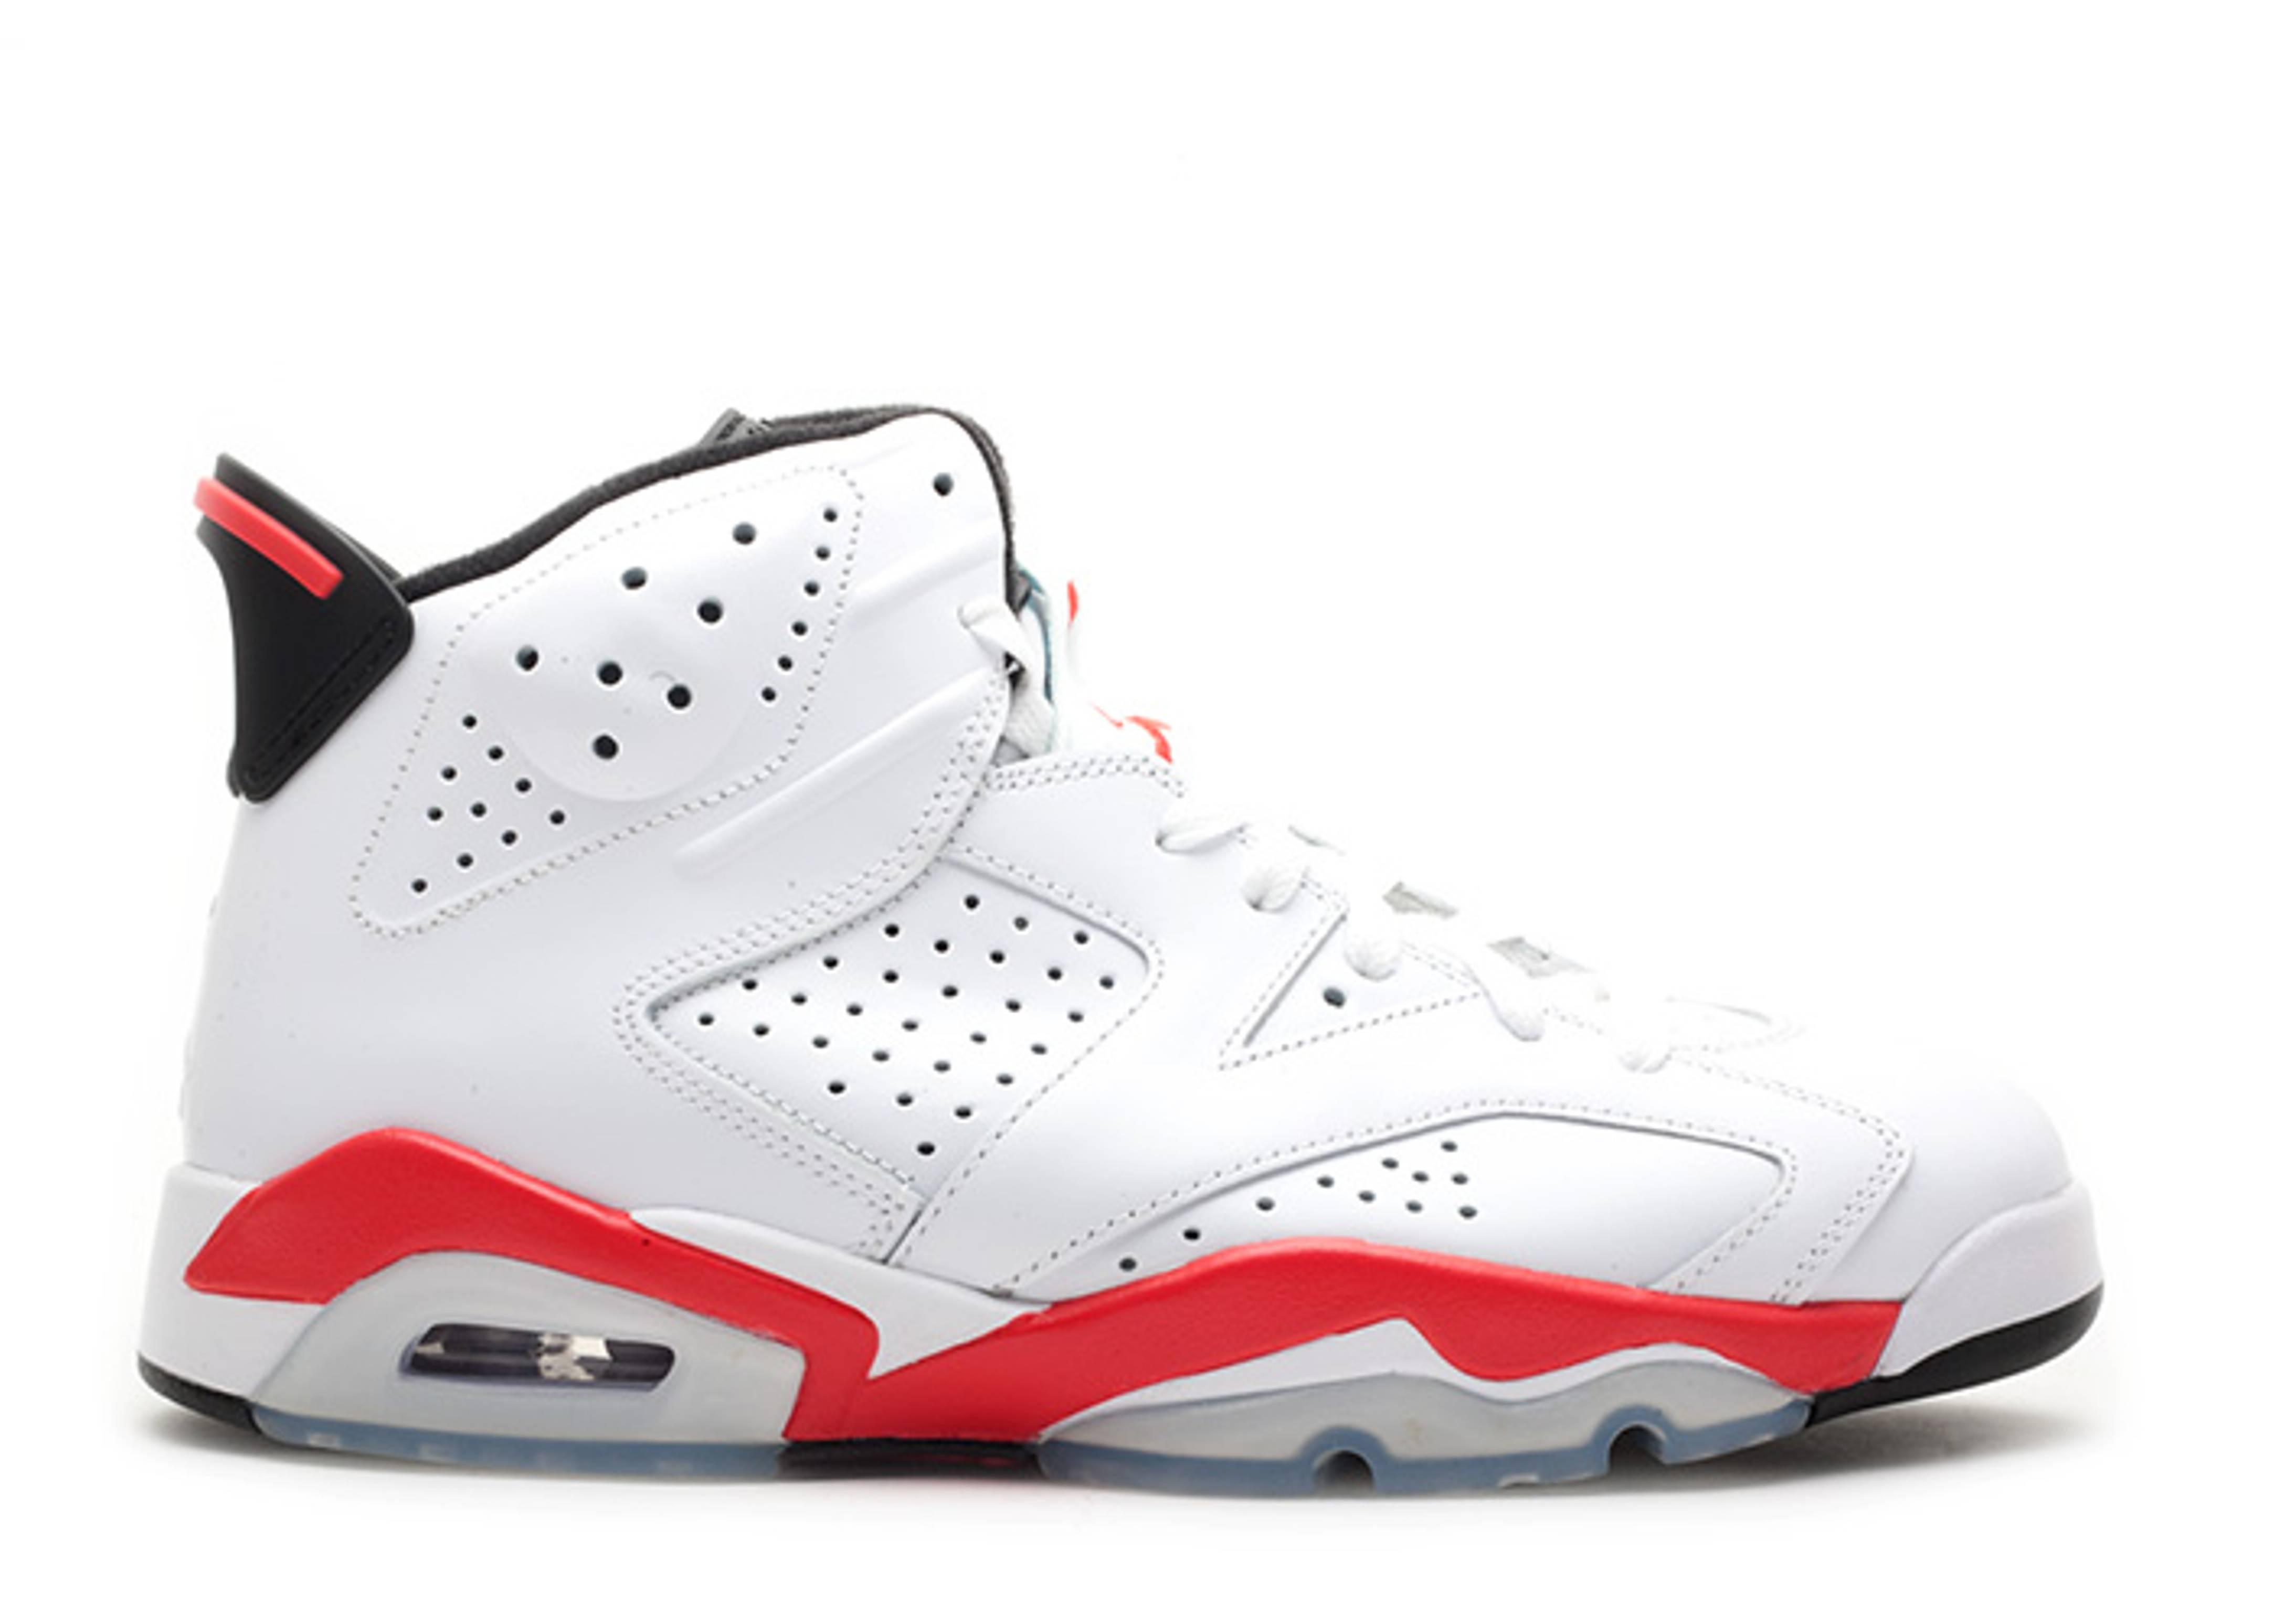 Nike to Release the Air Jordan III 'Seoul' in South Korea